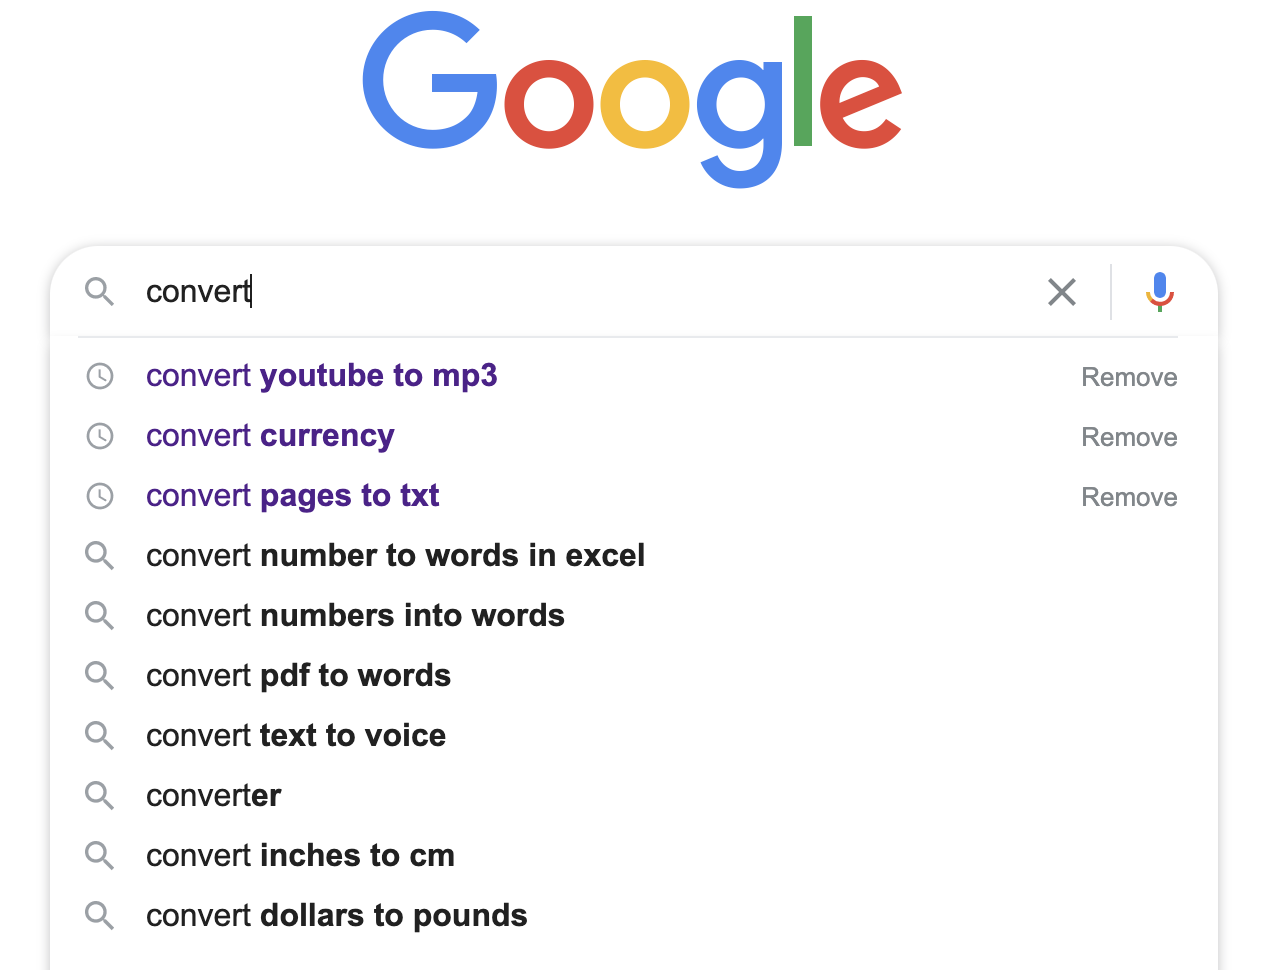 iamautocomplete: influence Google Autosuggest